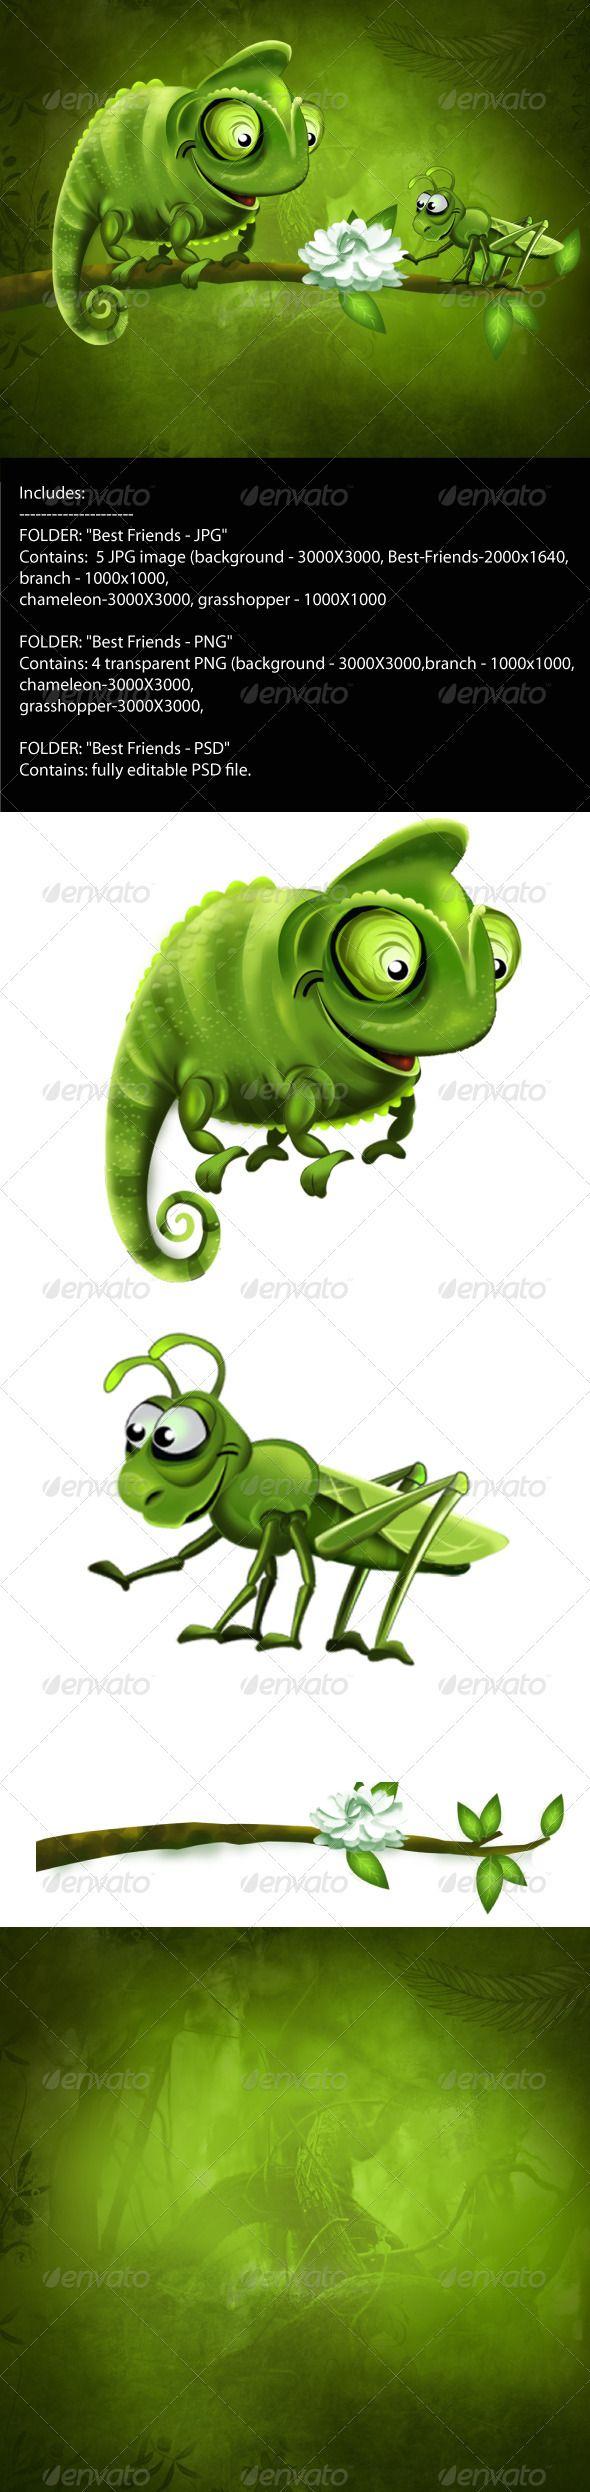 121 best iguana images on pinterest iguanas lizards and geckos